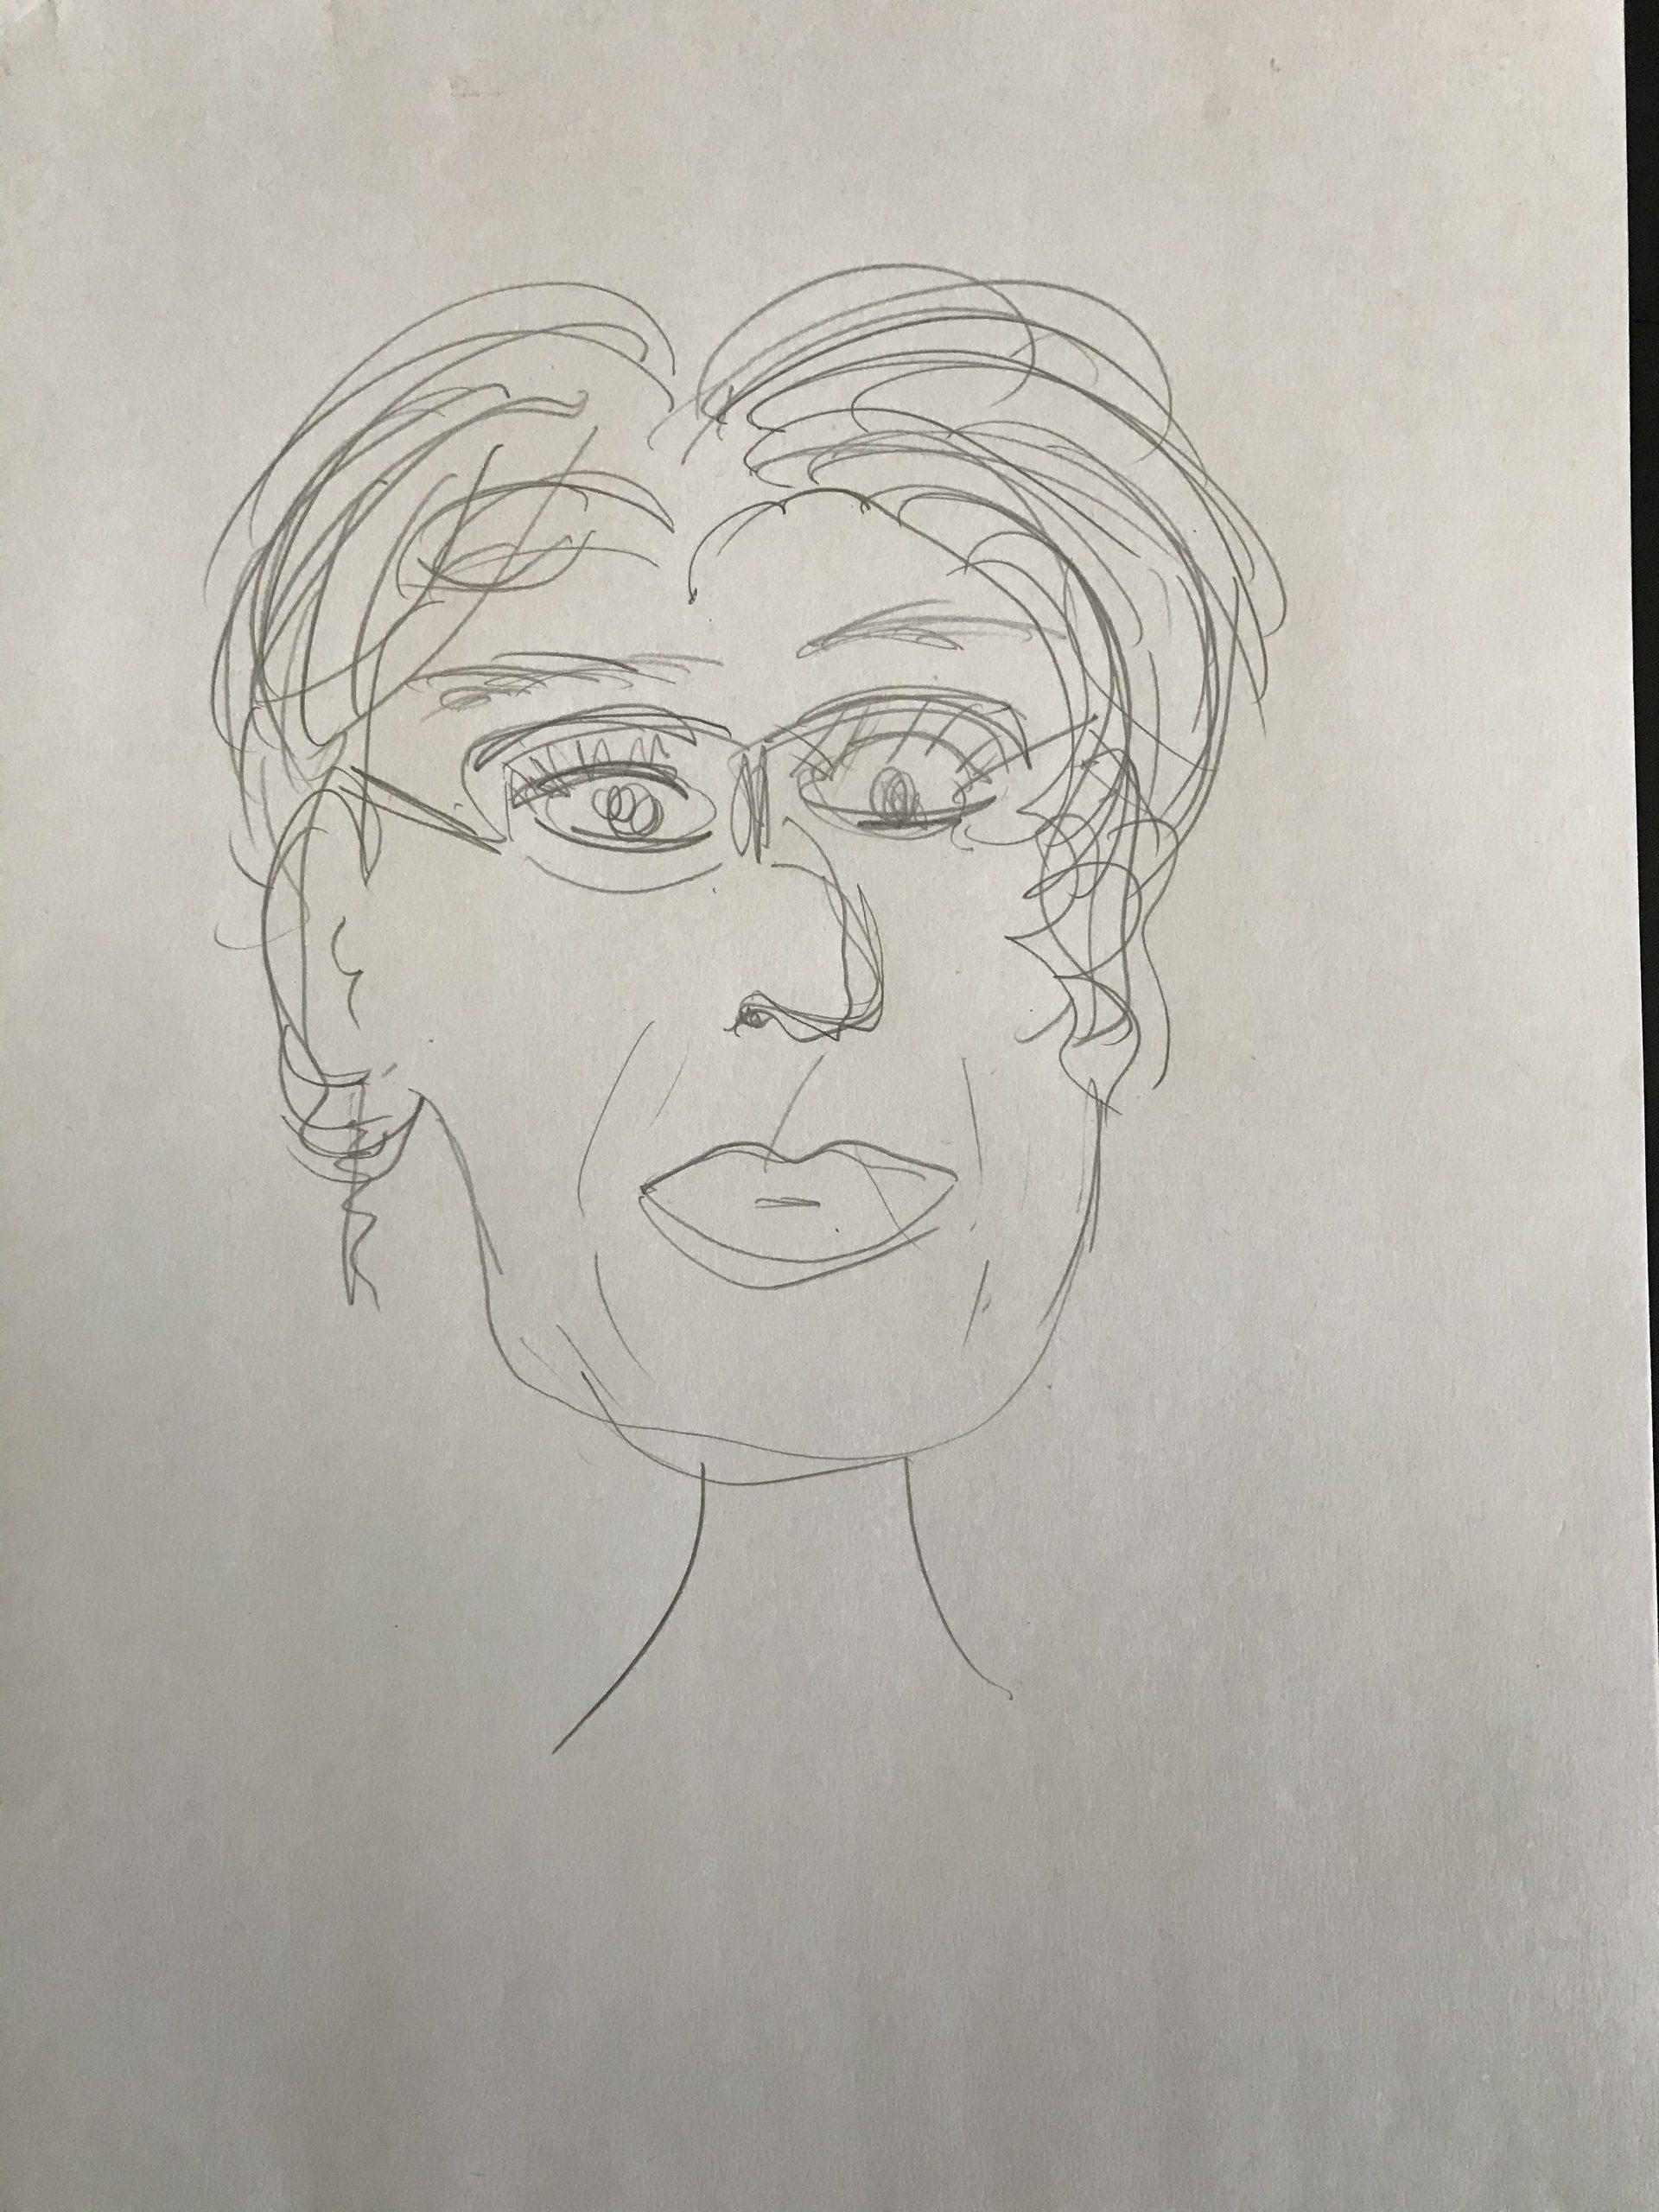 Lynne Hanley masterpiece for Erased